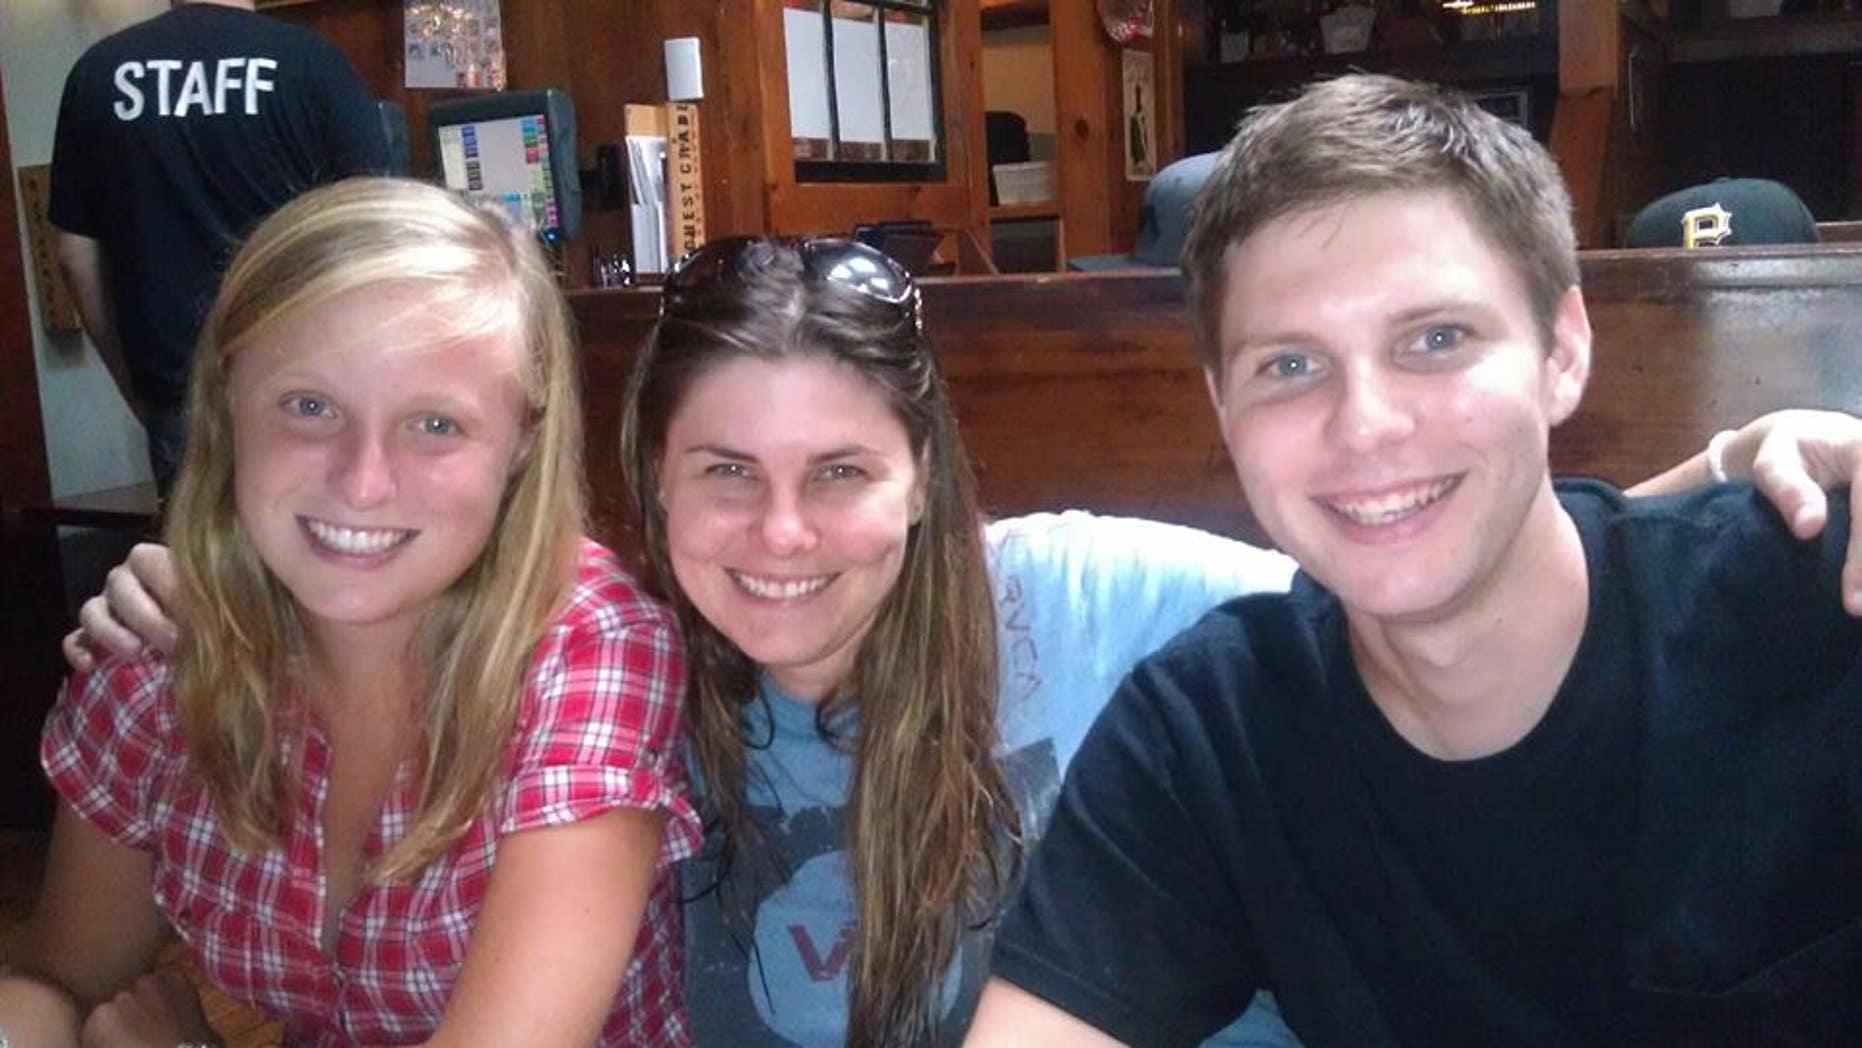 Dianne Thacher, left, was last seen Oct. 6 in Santa Barbara, Calif.